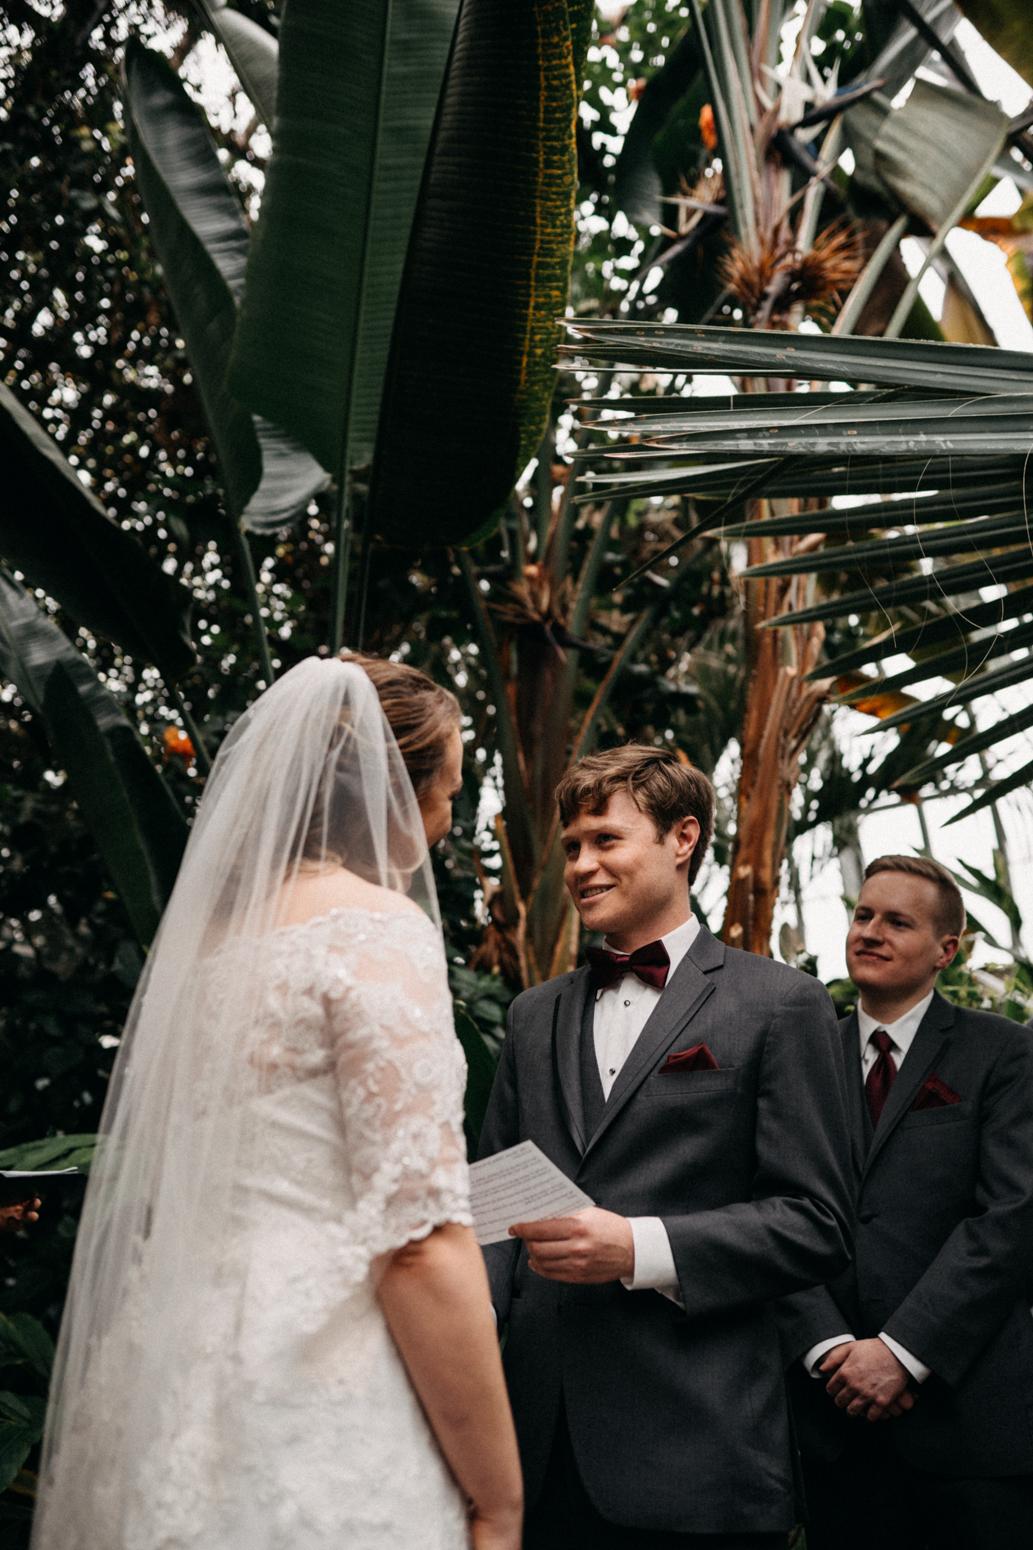 Rochester, NY Wedding Photographer (56 of 96).JPG